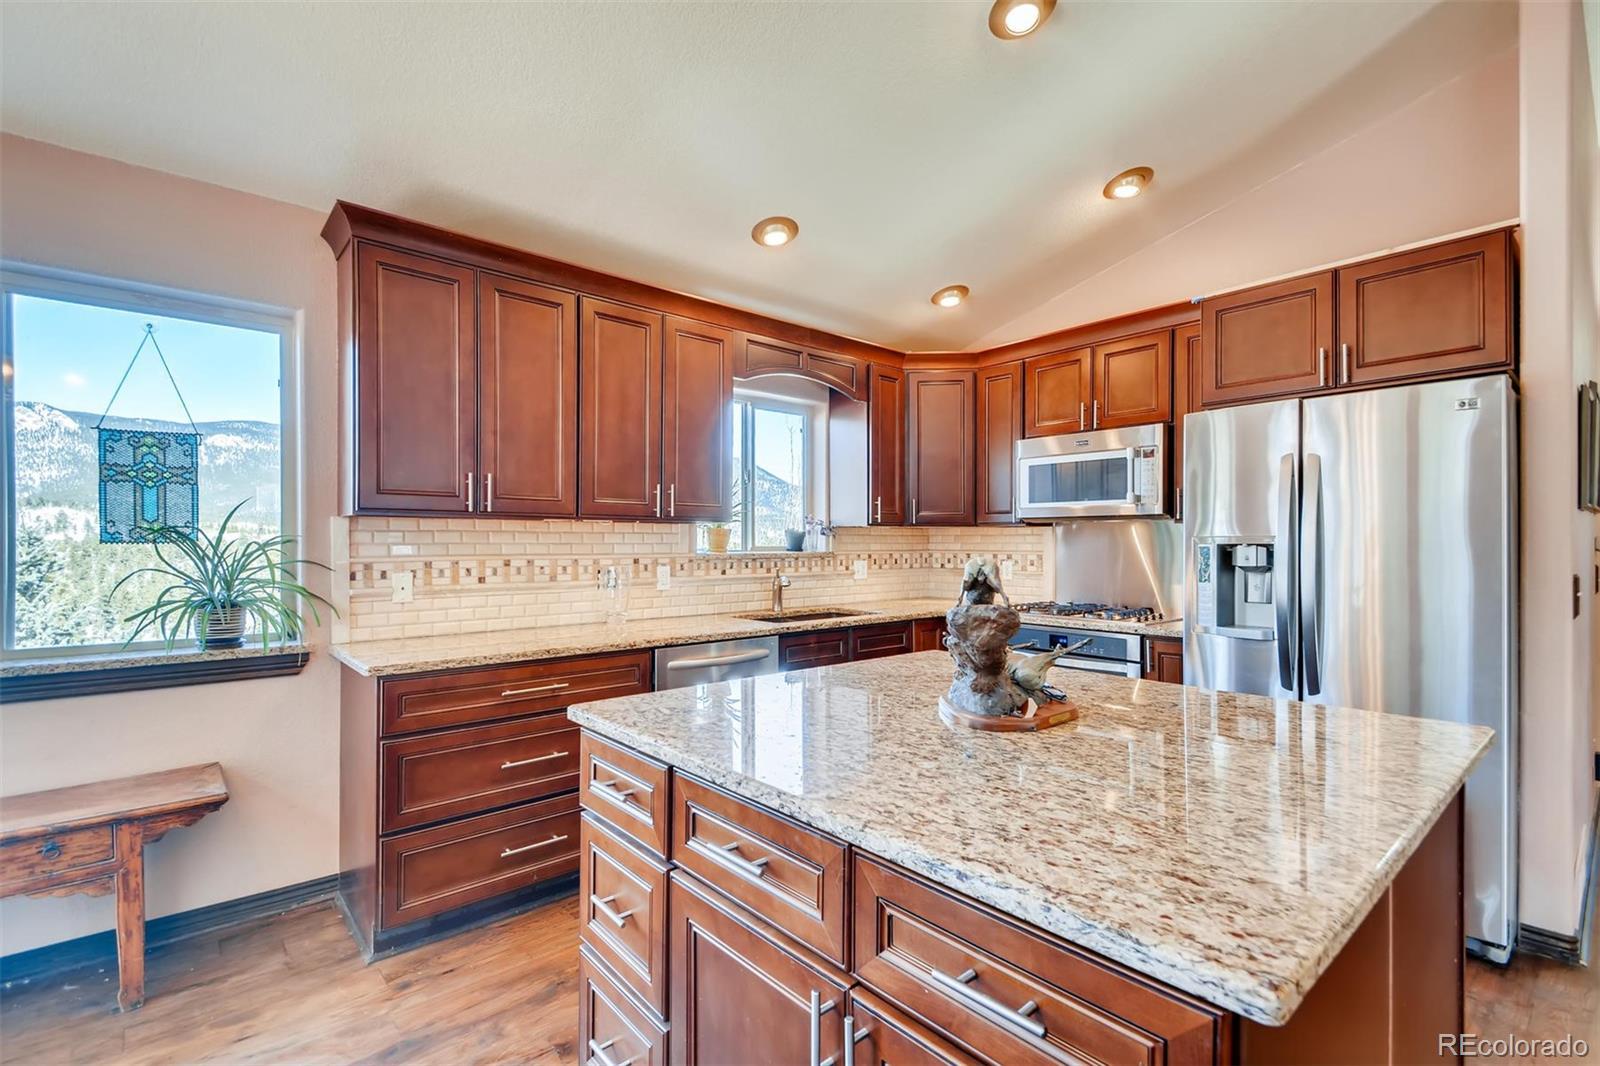 MLS# 8127847 - 3 - 515 Gold Flake Terrace, Bailey, CO 80421